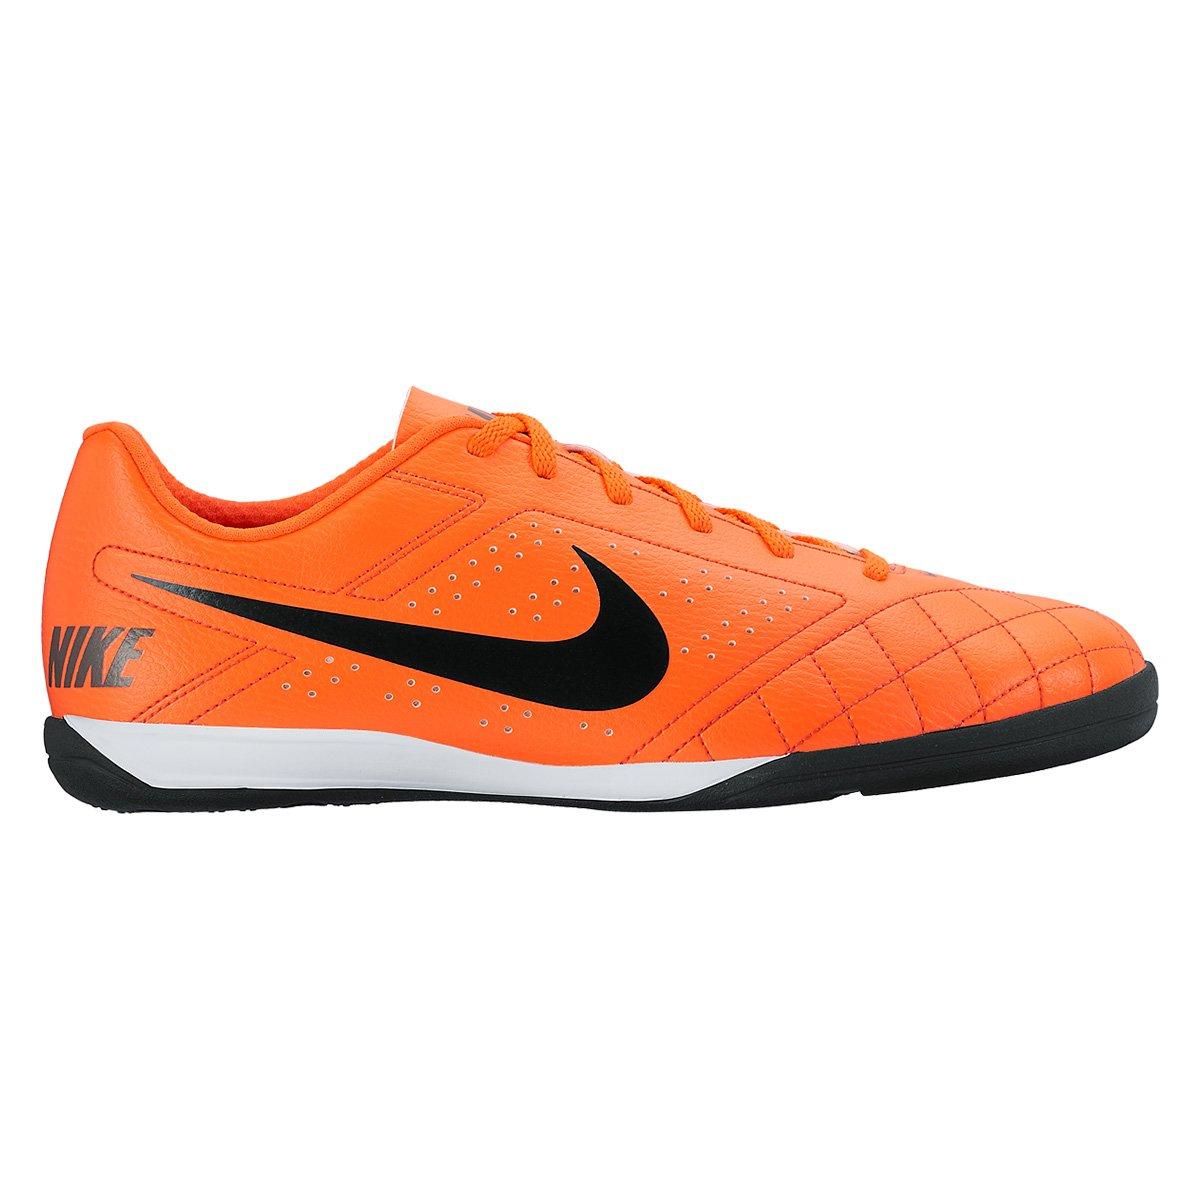 153caf7d08 Chuteira Futsal Nike Beco 2 Futsal - Laranja - Compre Agora